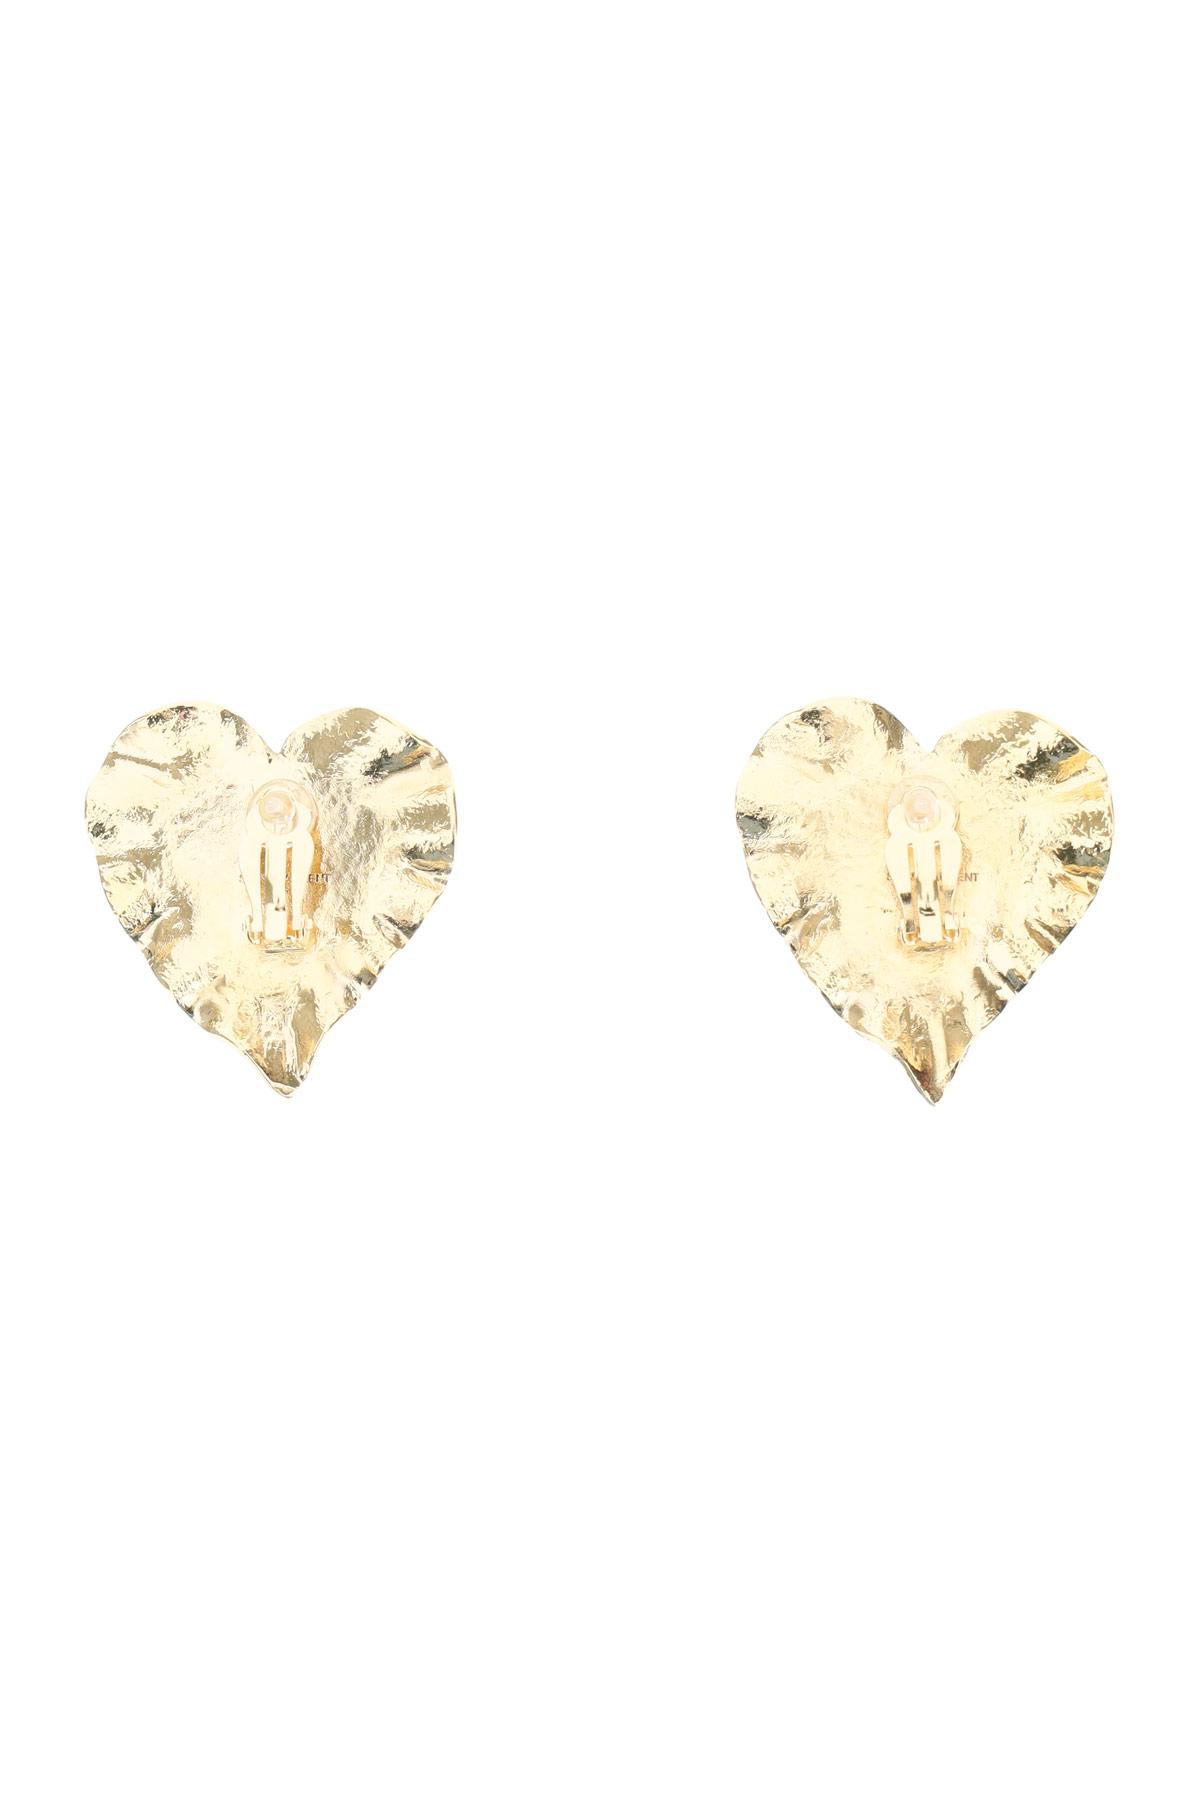 Saint laurent orecchini heritage coeur double